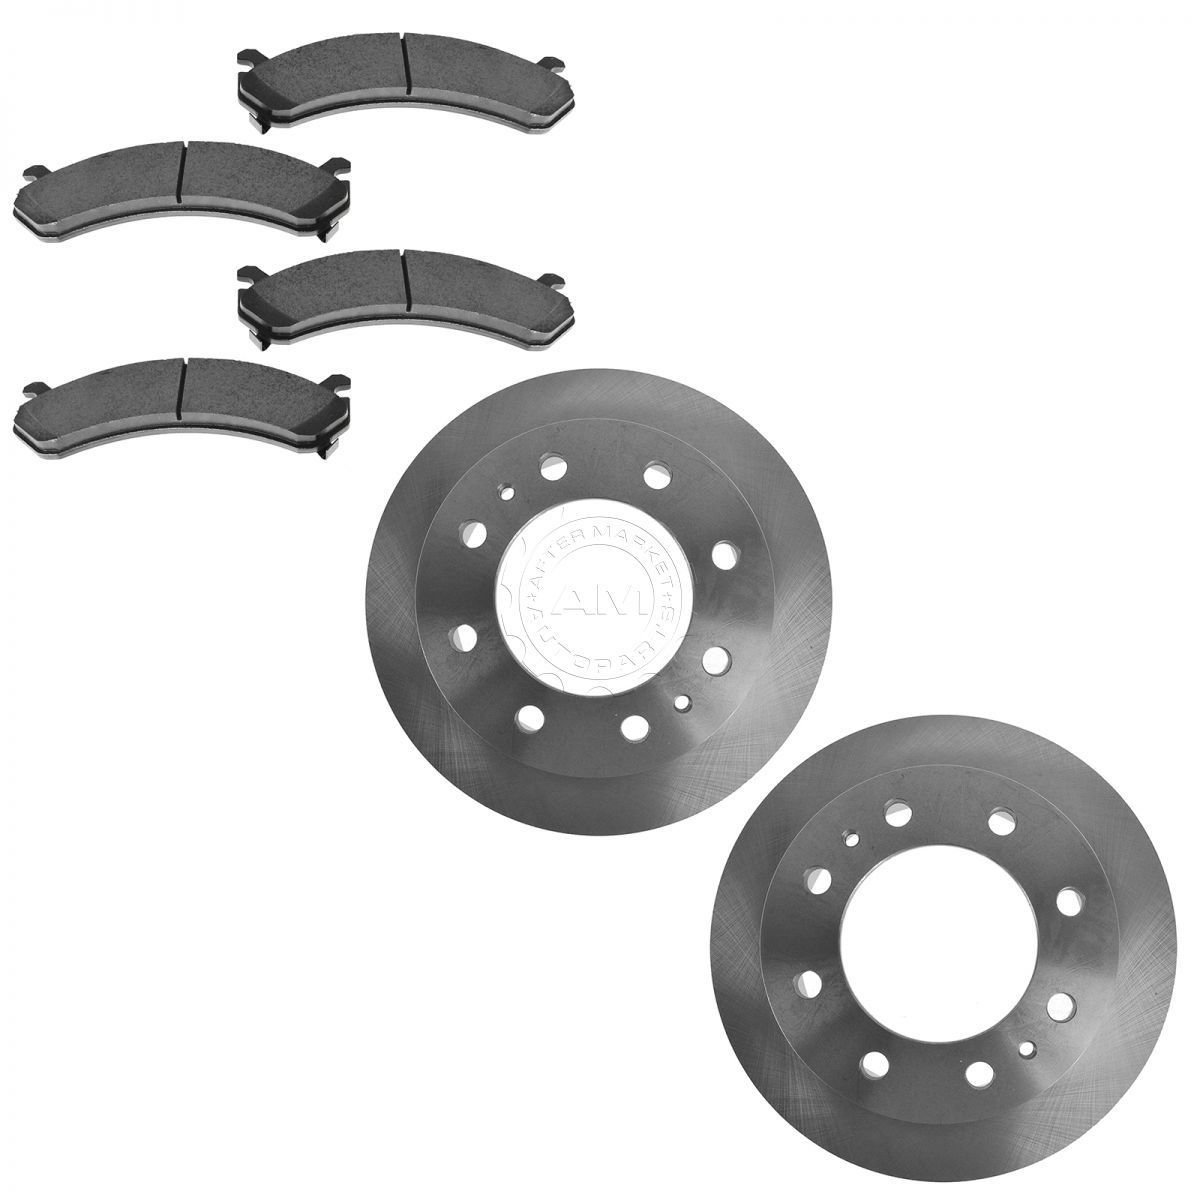 Brake Pad Material Types : New nakamoto front premium posi ceramic disc brake pad